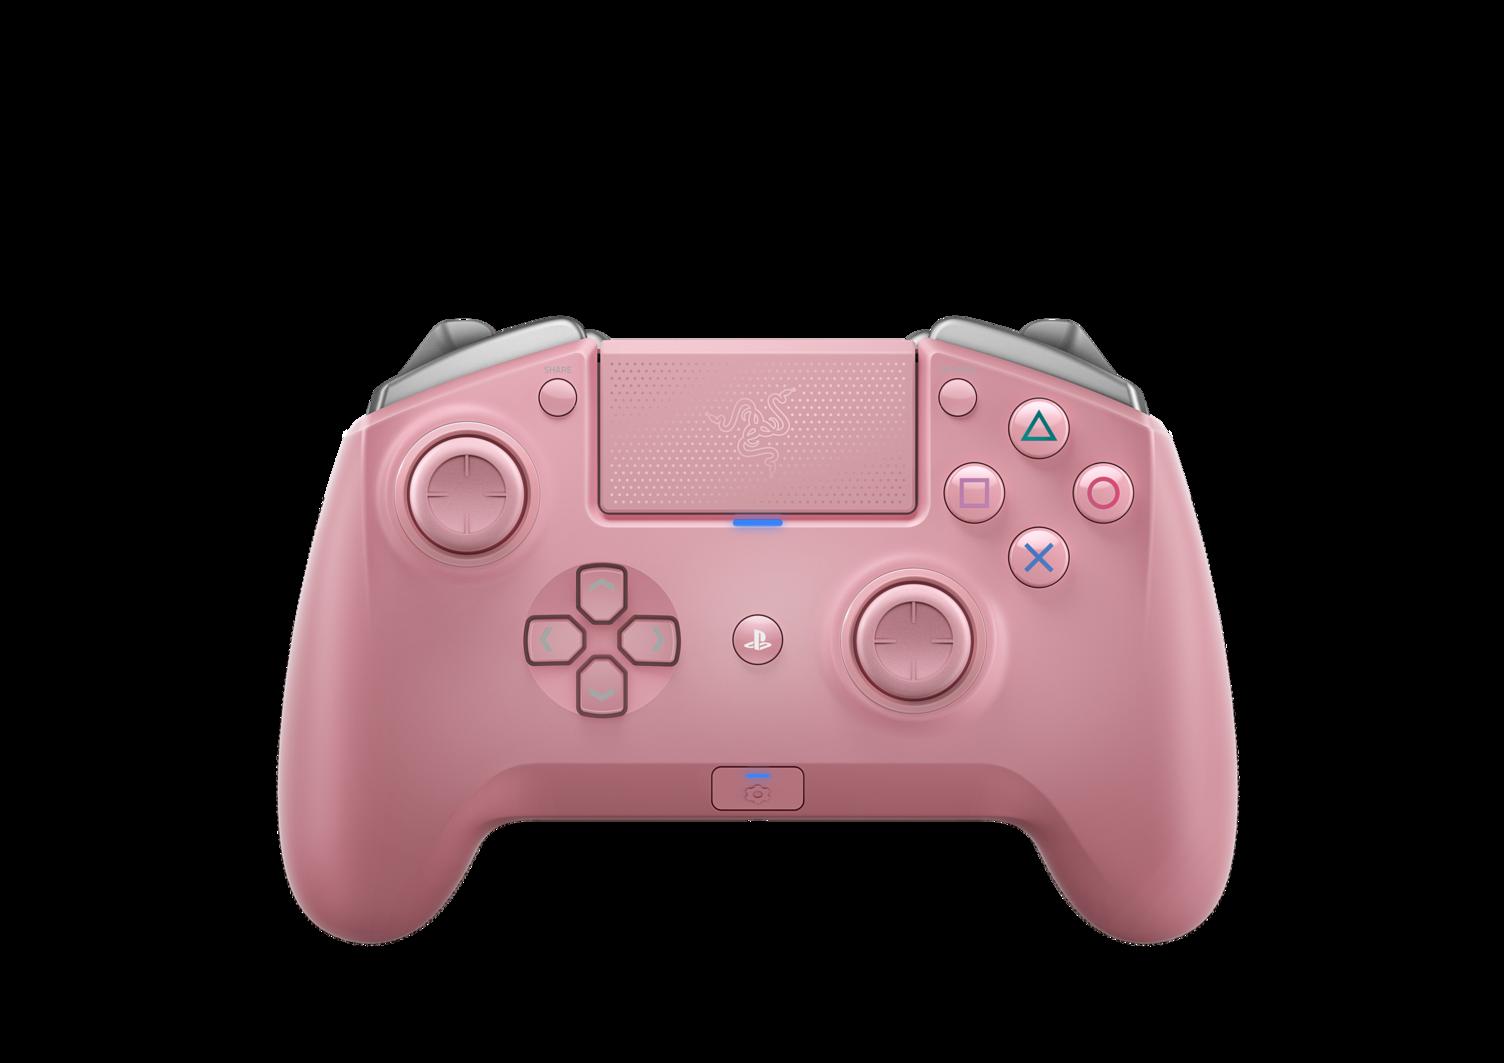 Razer Raiju Tournament Quartz Edition Wireless Joystick for PS4 , PC ของแท้ ประกันศูนย์ 1ปี จอยเกม สำหรับคอม และ PS4